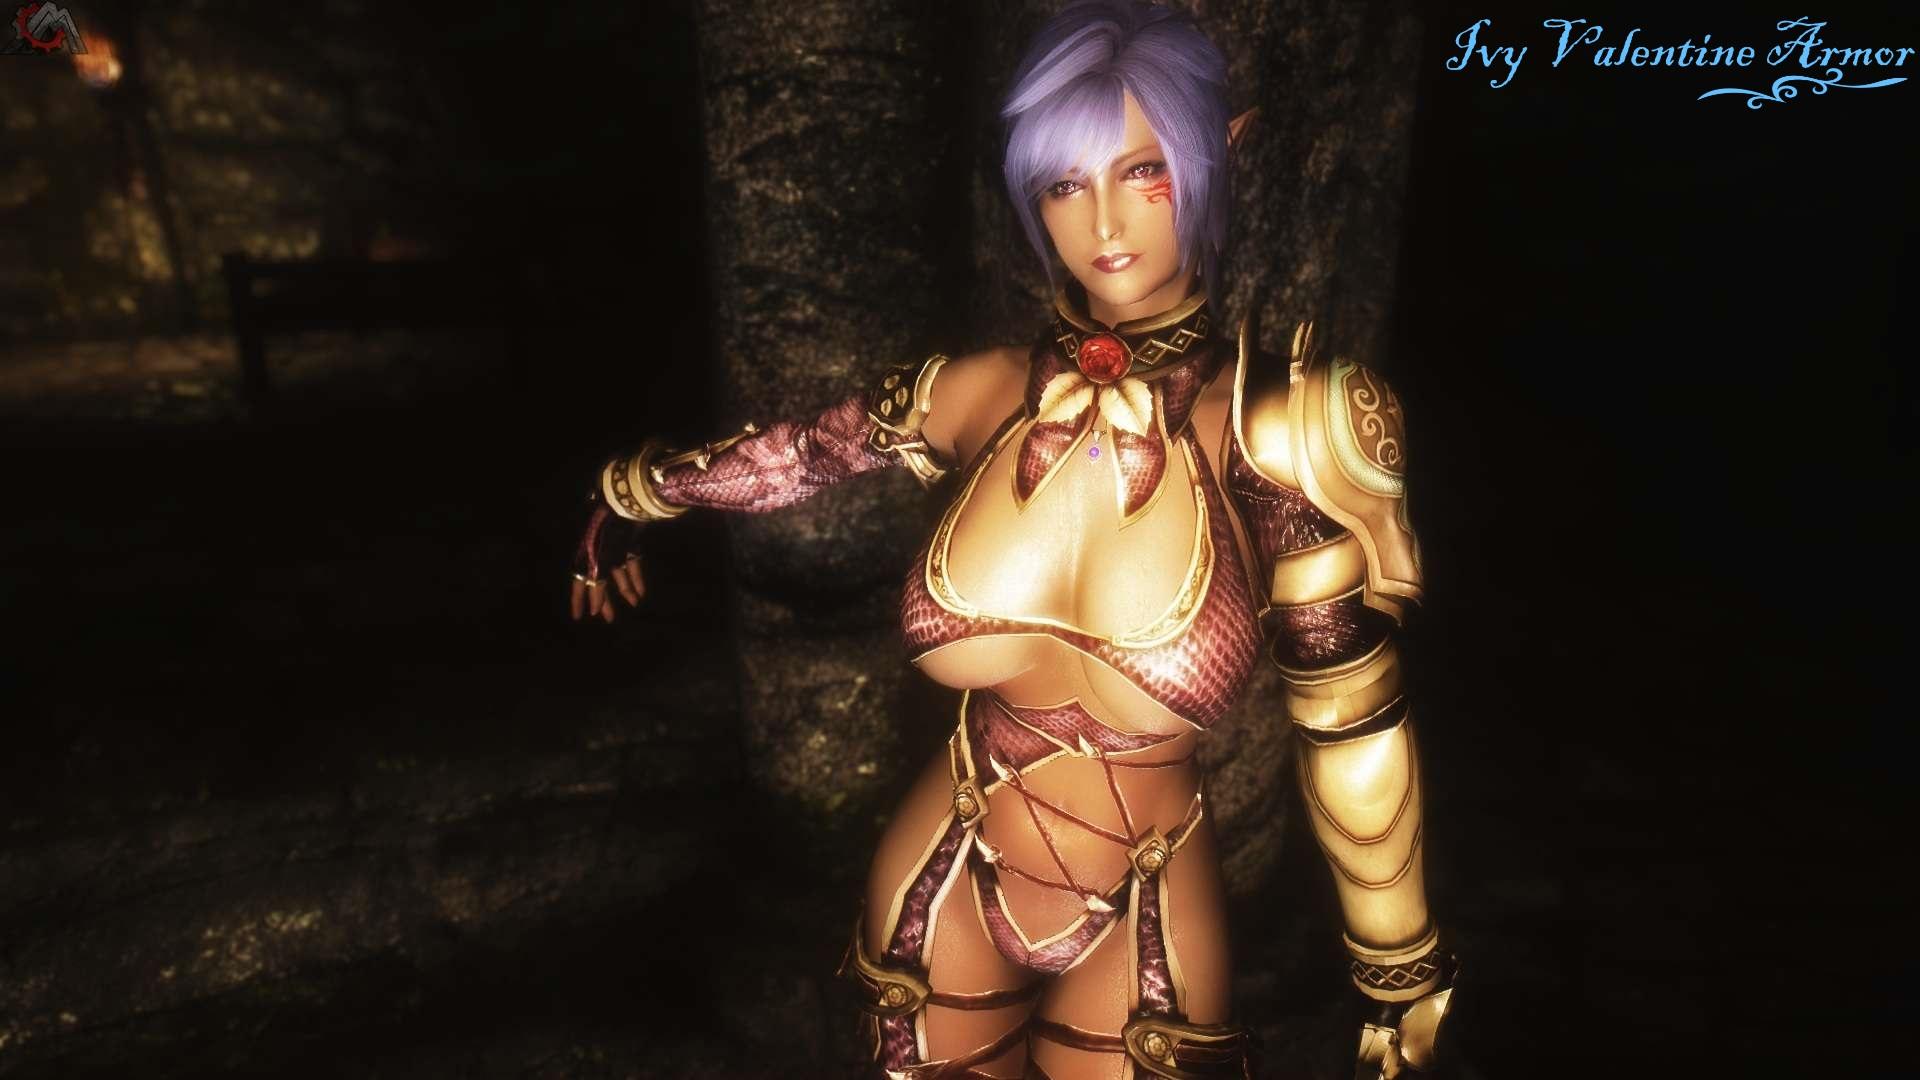 Ivy_Valentine_Armor_CBBE.jpg